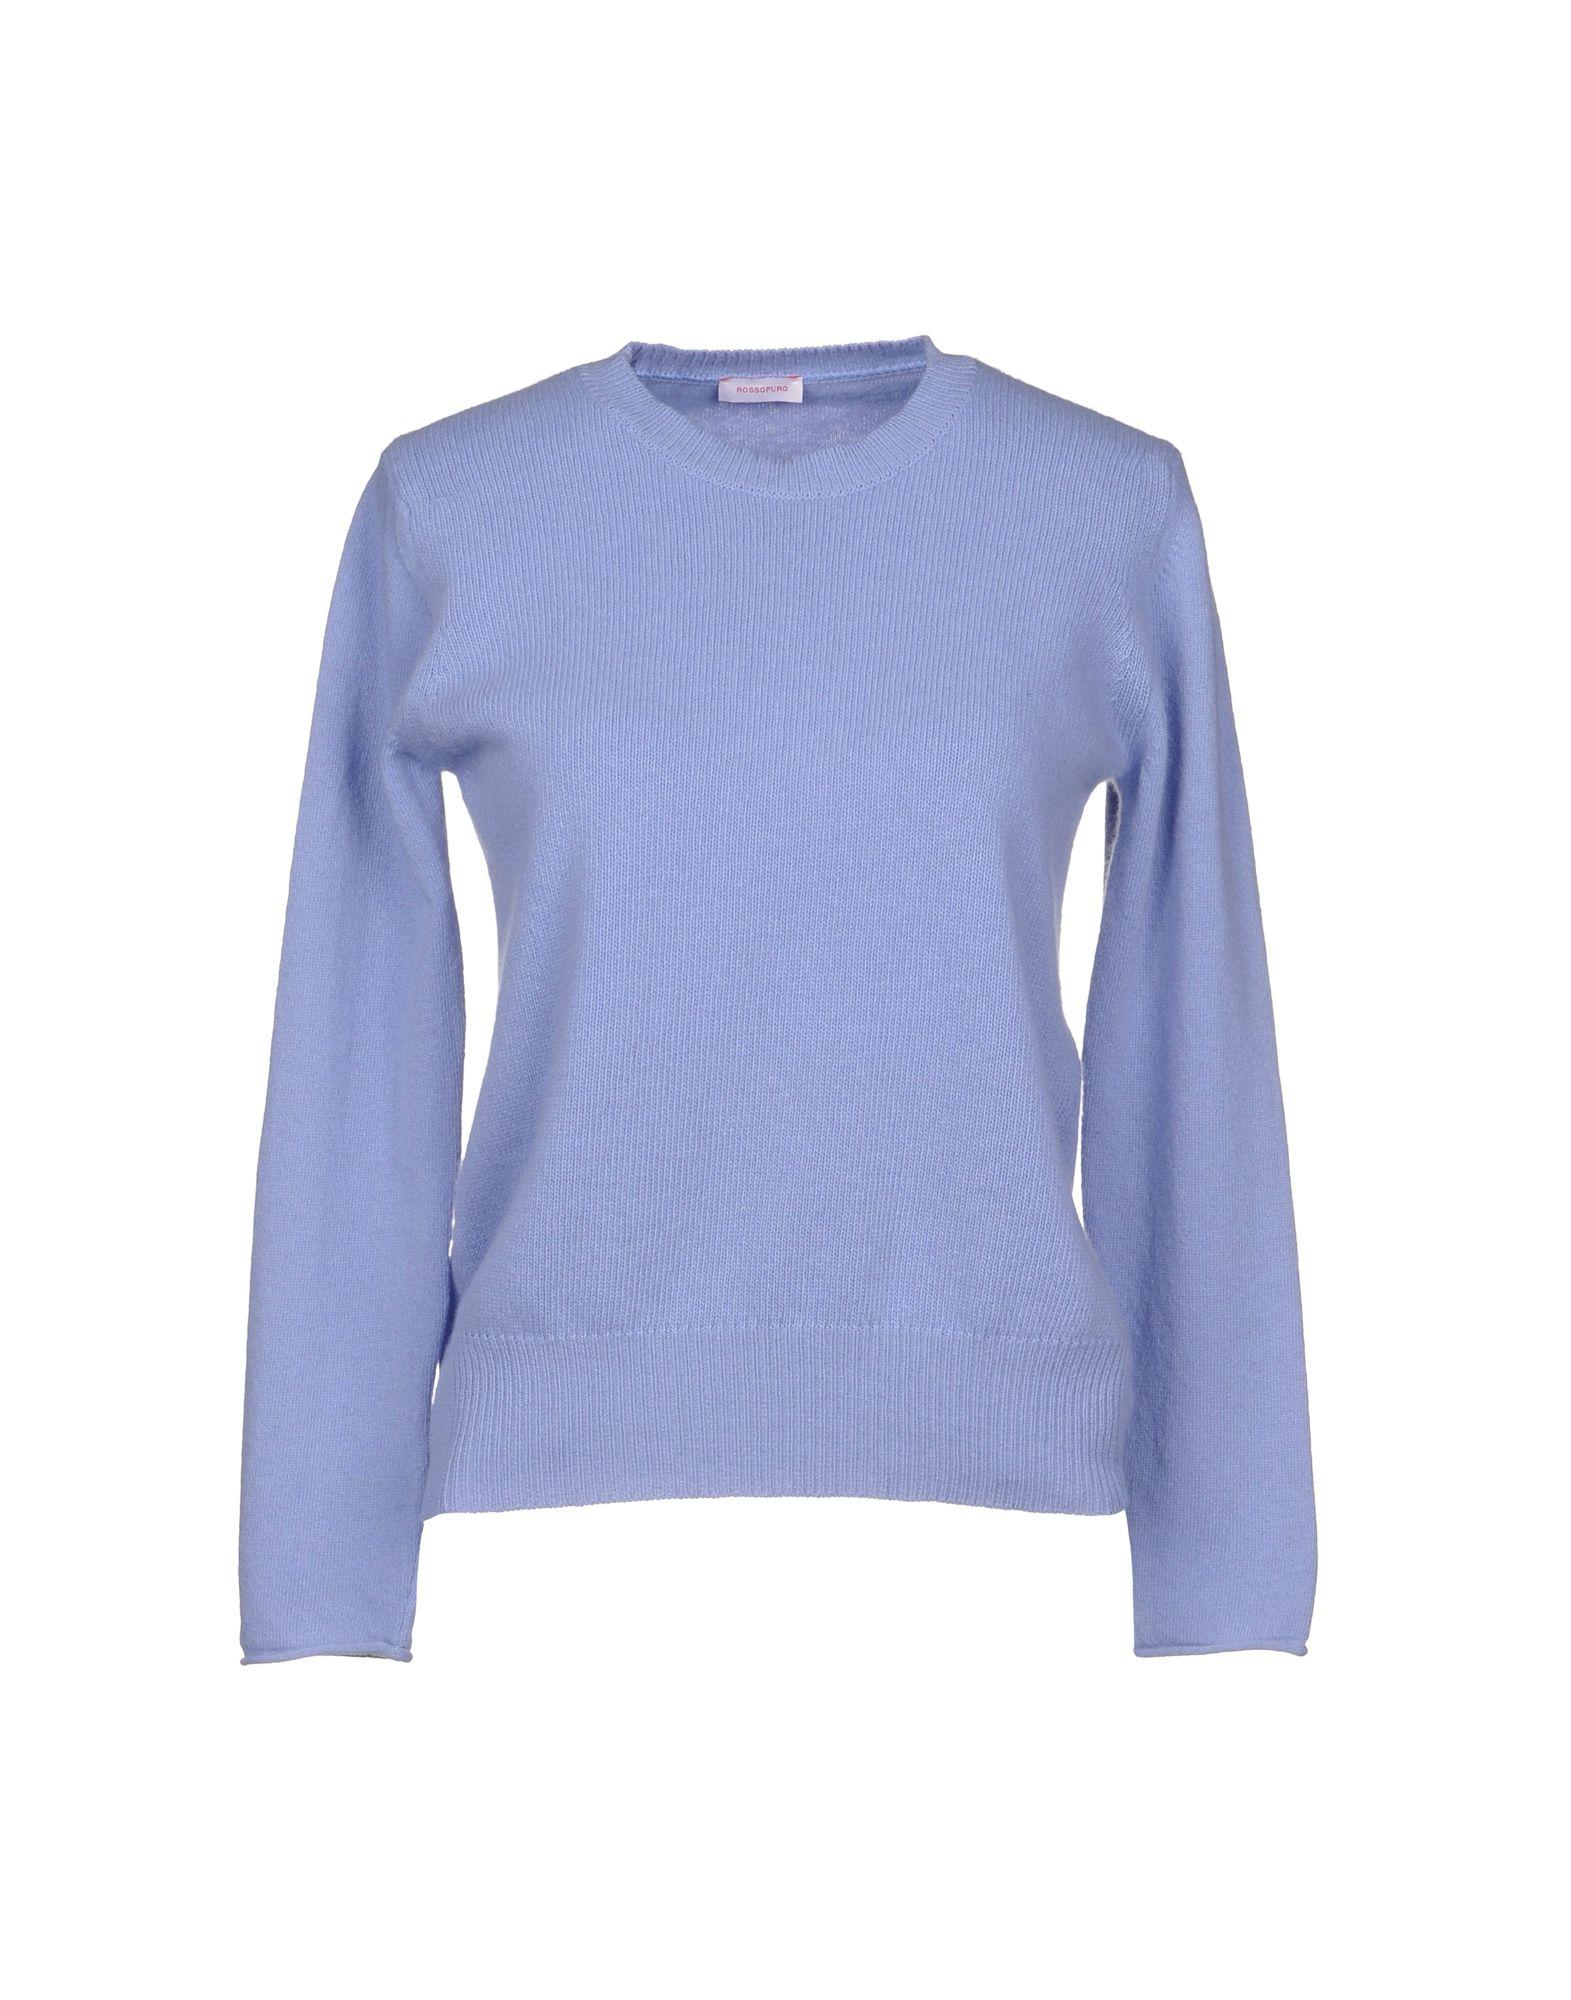 Pullover Rossopuro Donna - Acquista online su